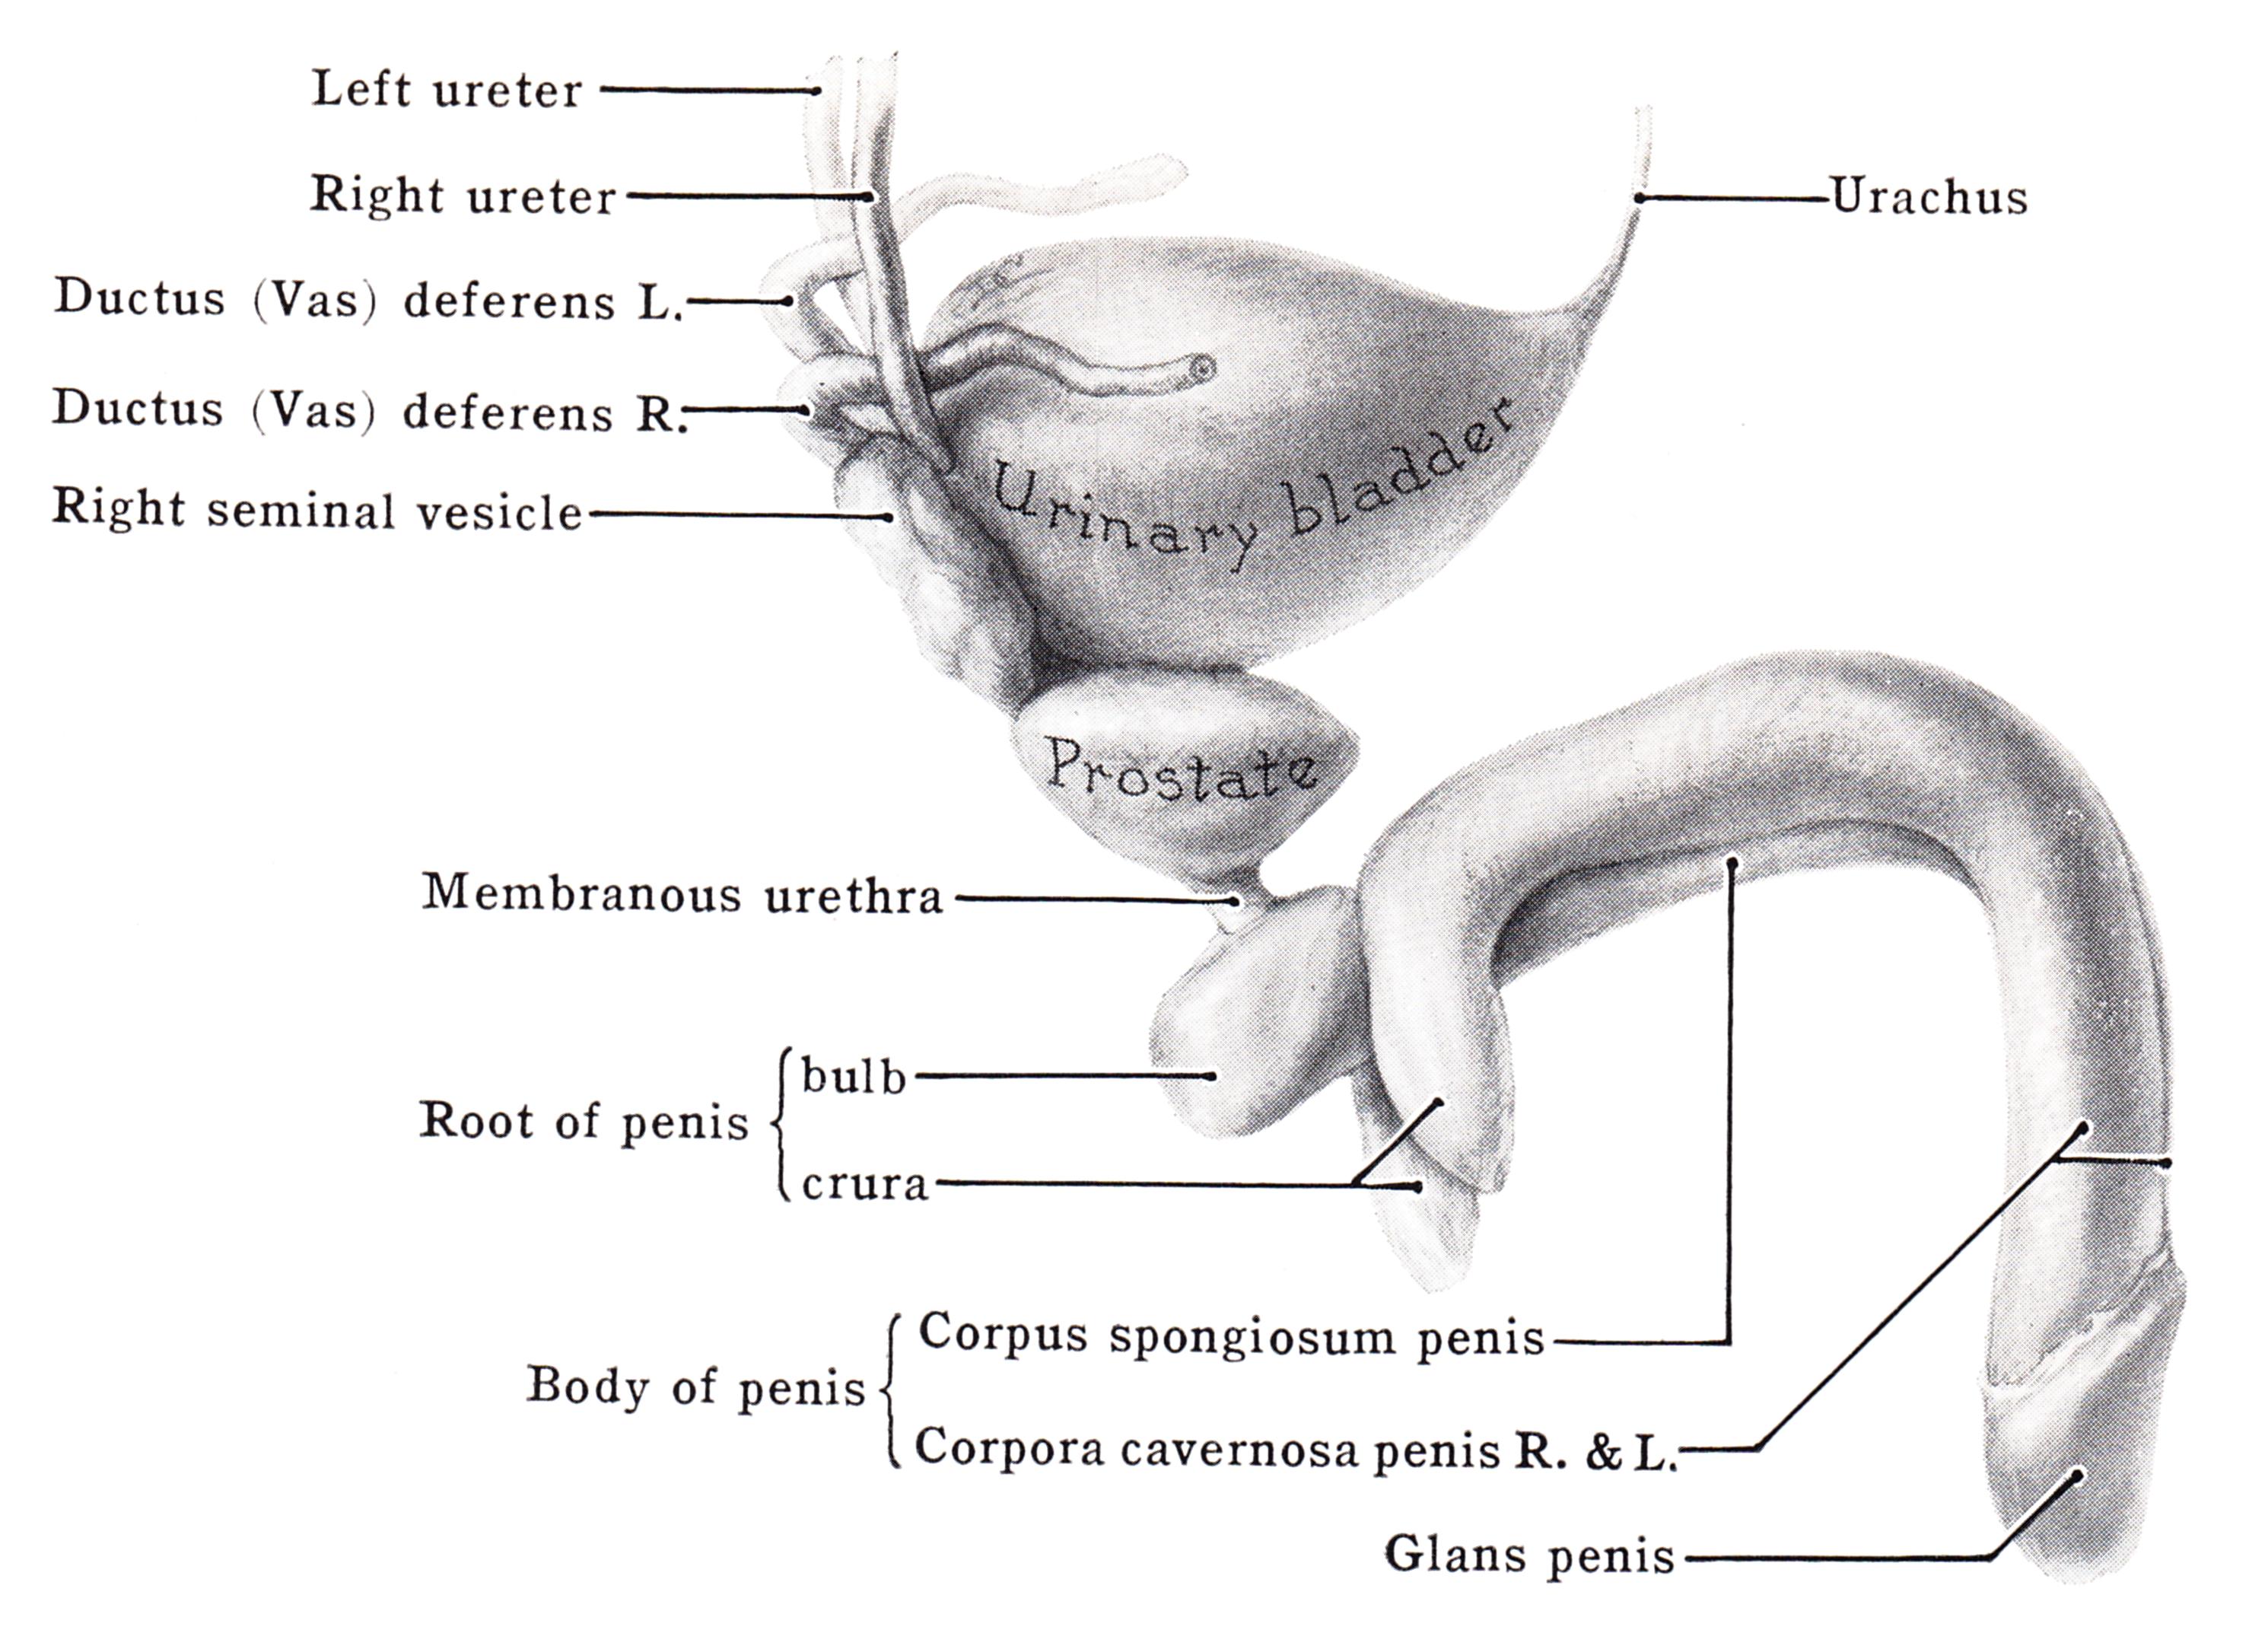 pénisz corpus cavernosum jelent kis péniszemet